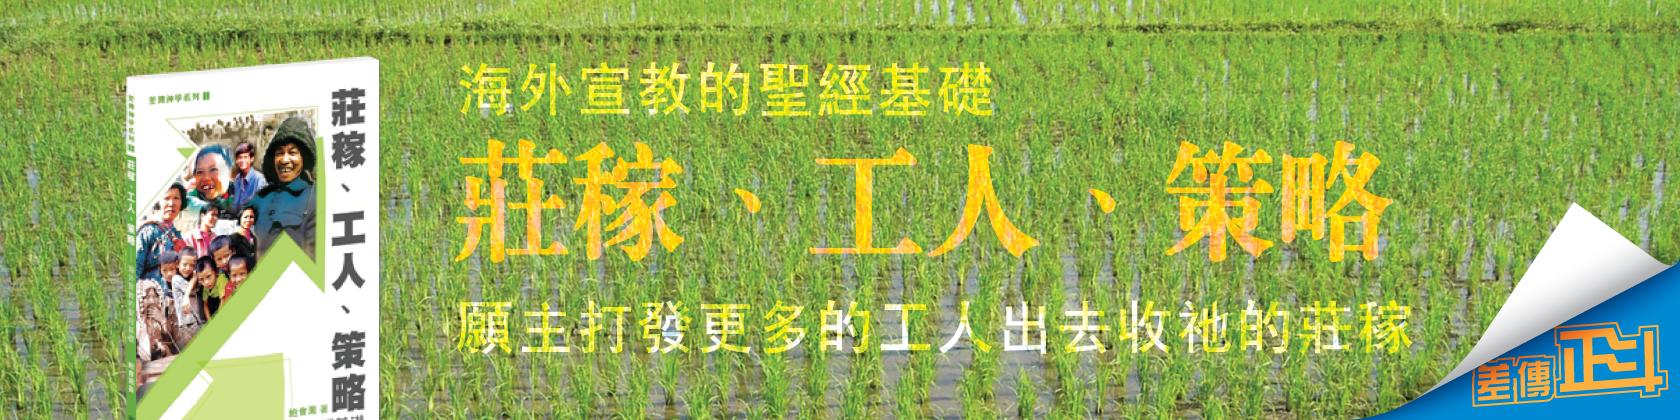 CB-01-web-banner-1680-x-420-B2-02